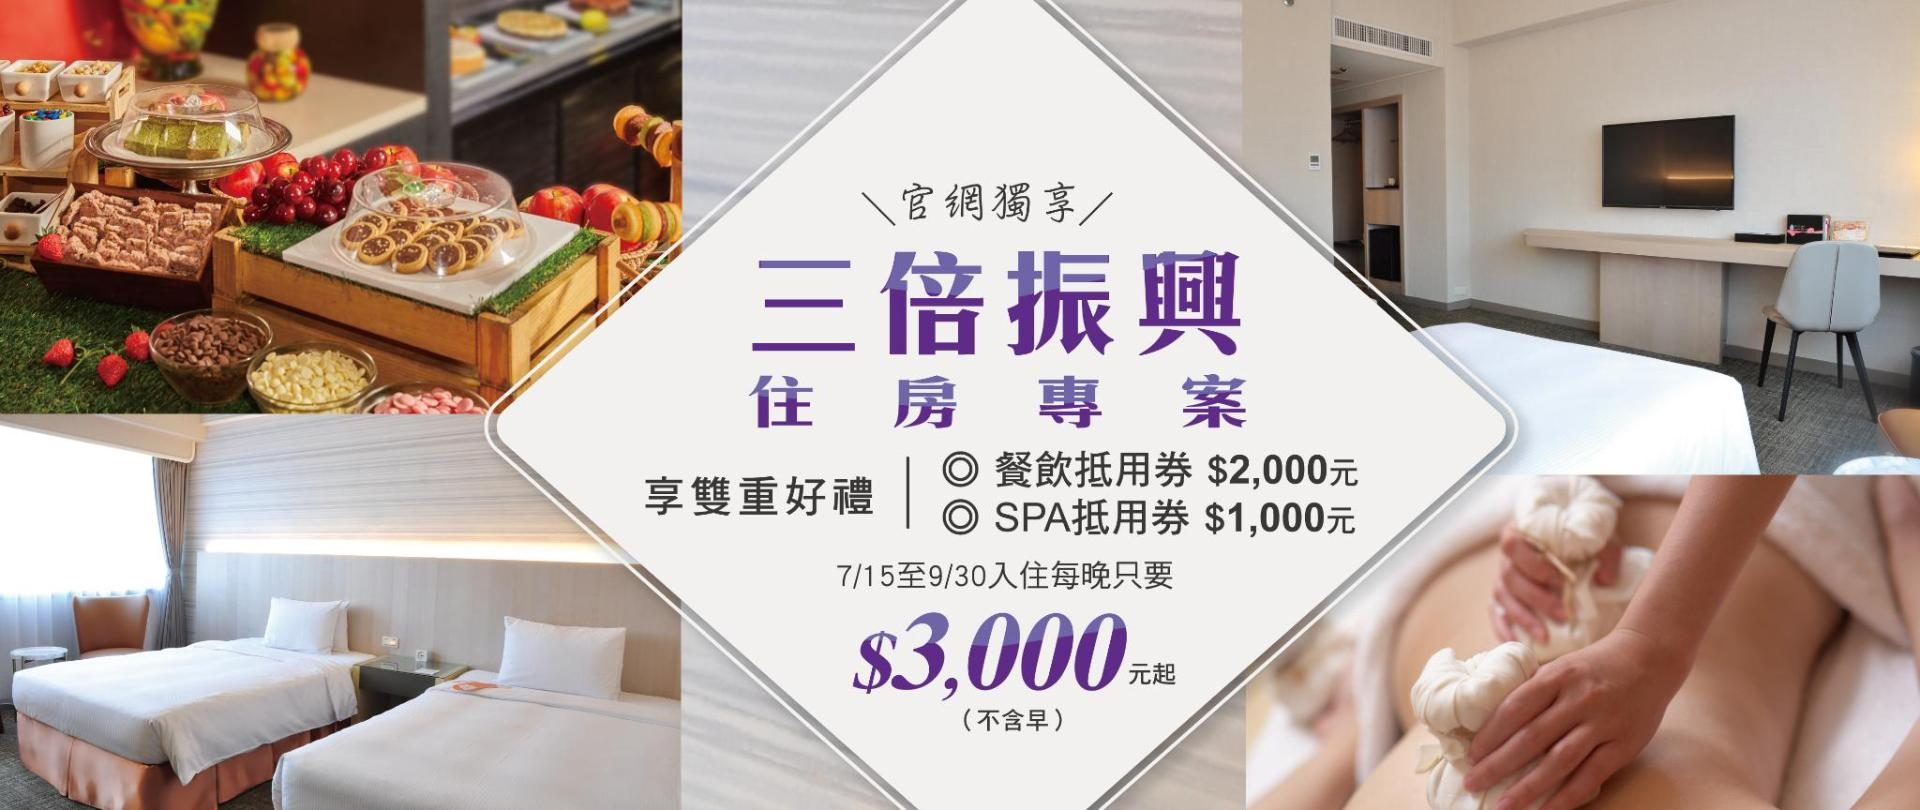 Slide Show1920X810_三倍振興.jpg